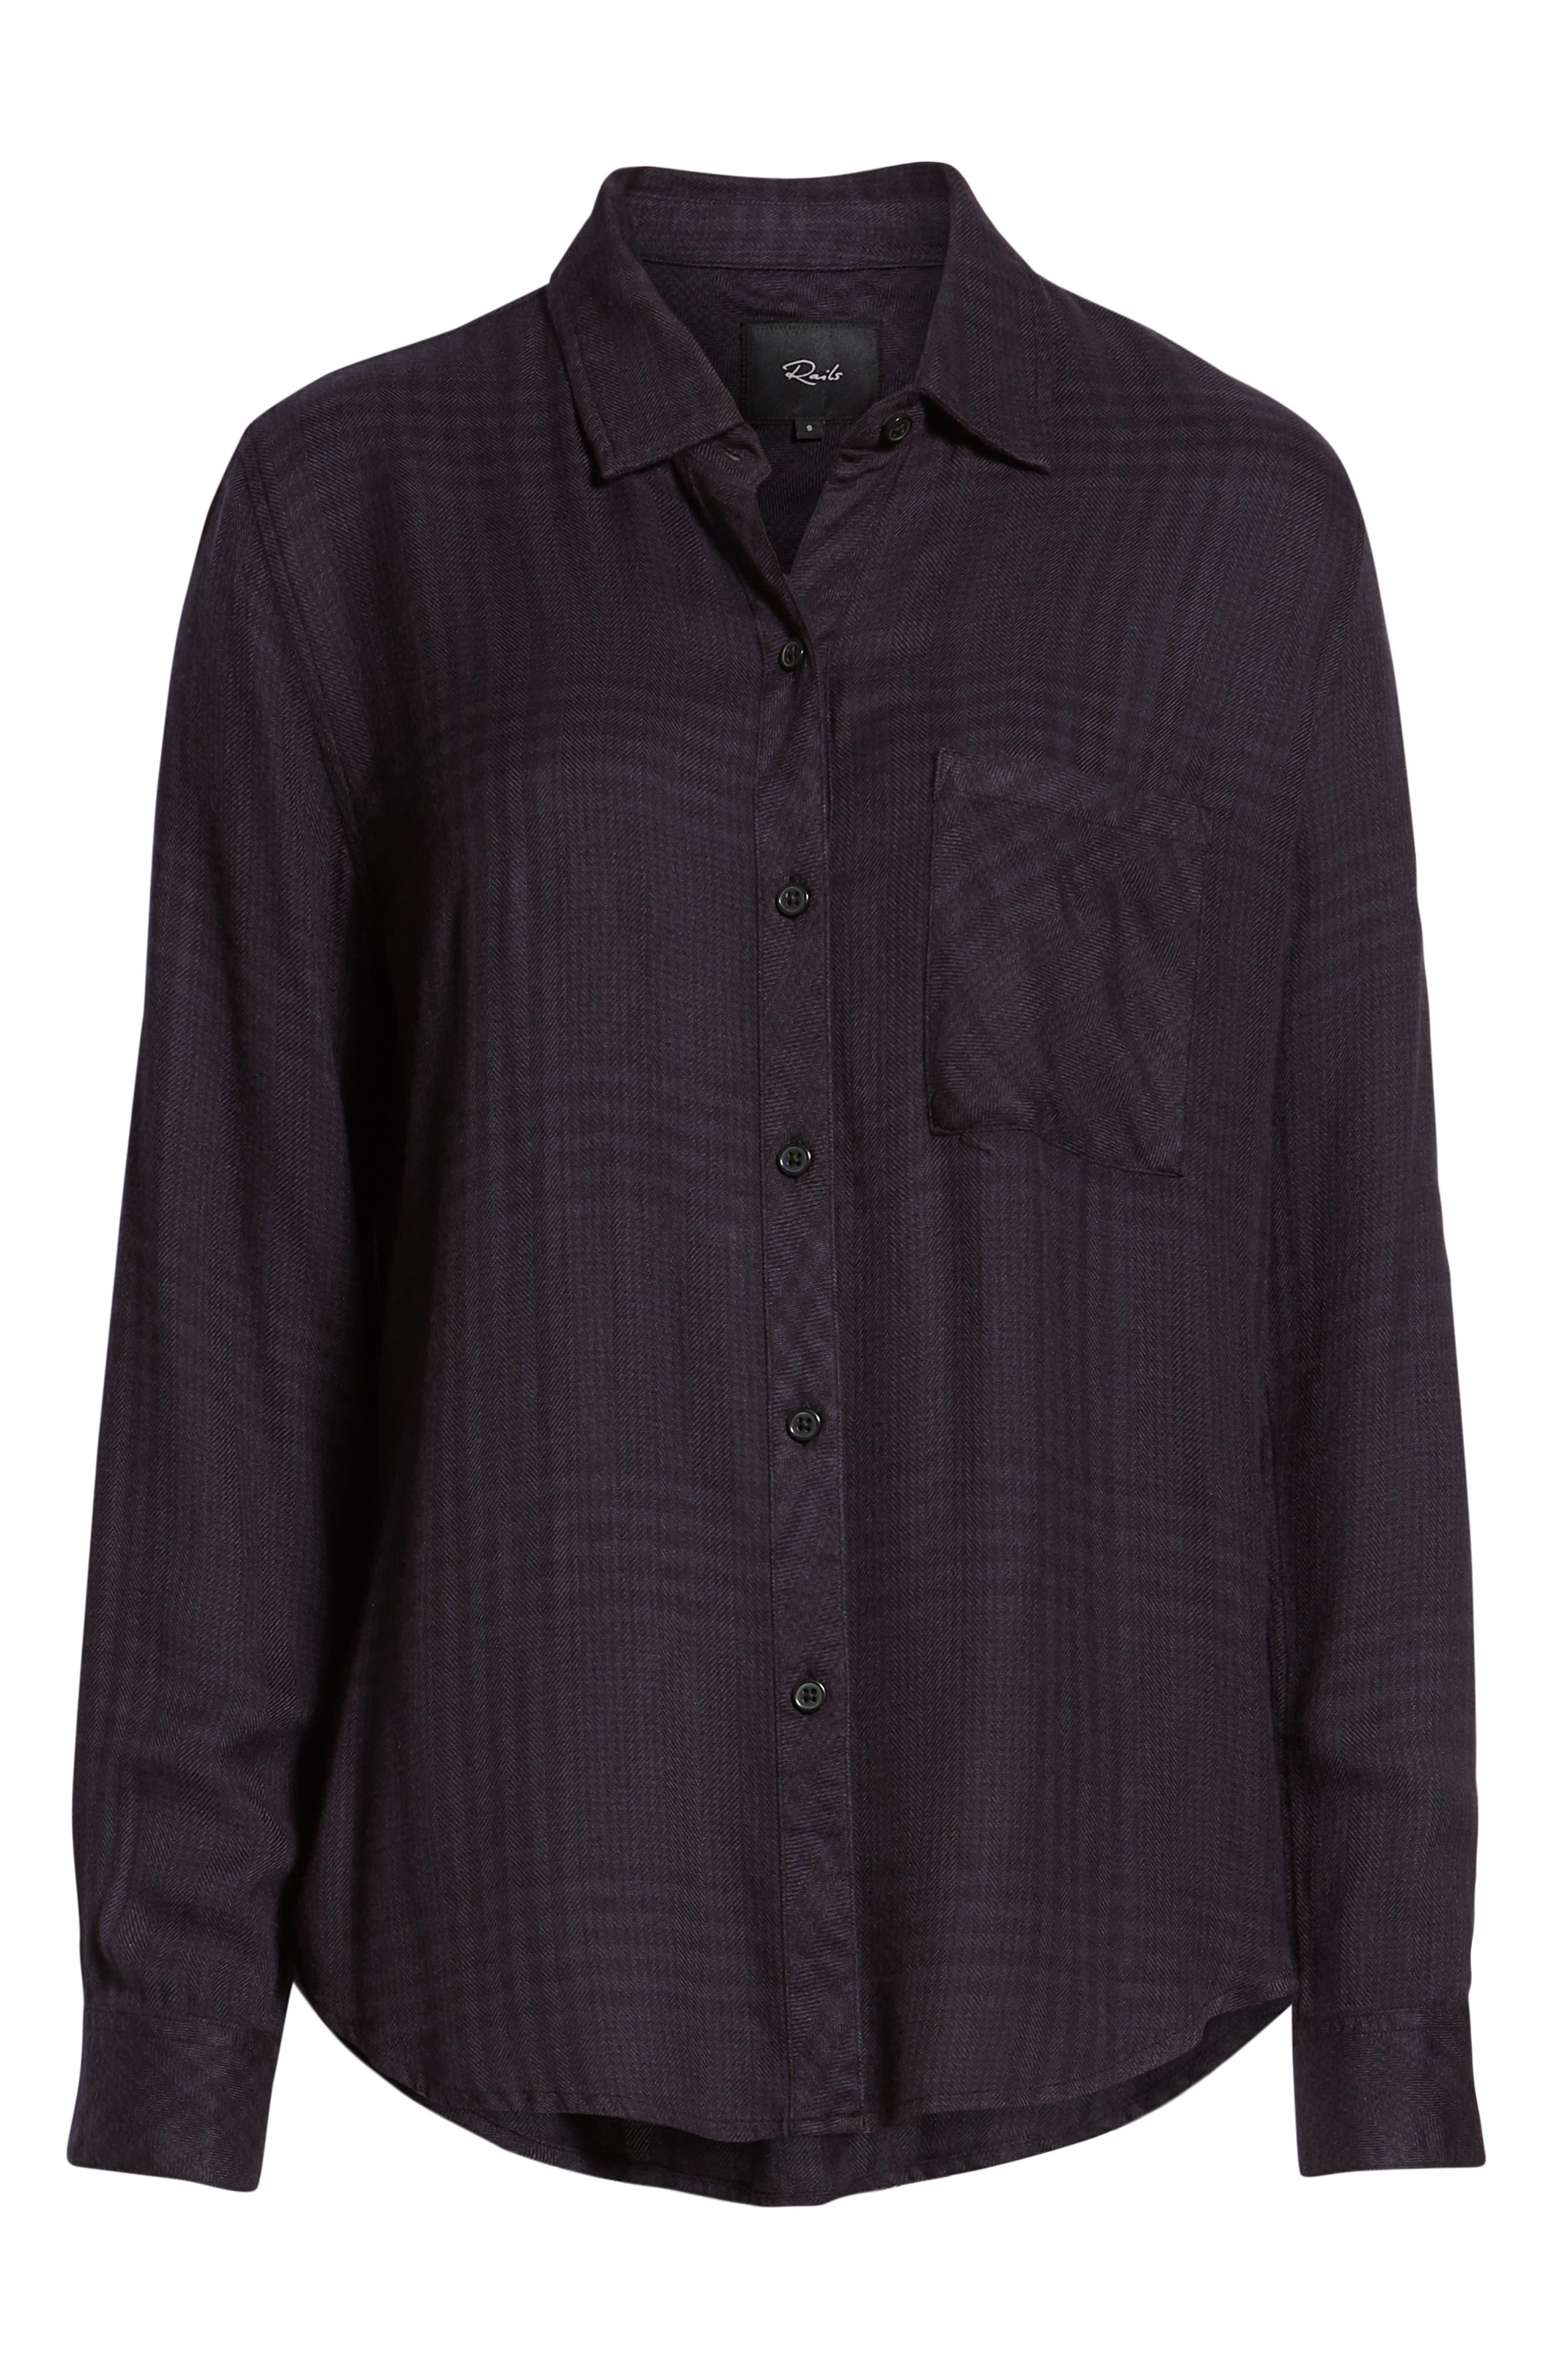 Hunter Plaid Shirt,                             Alternate thumbnail 7, color,                             CHARCOAL SHADOW